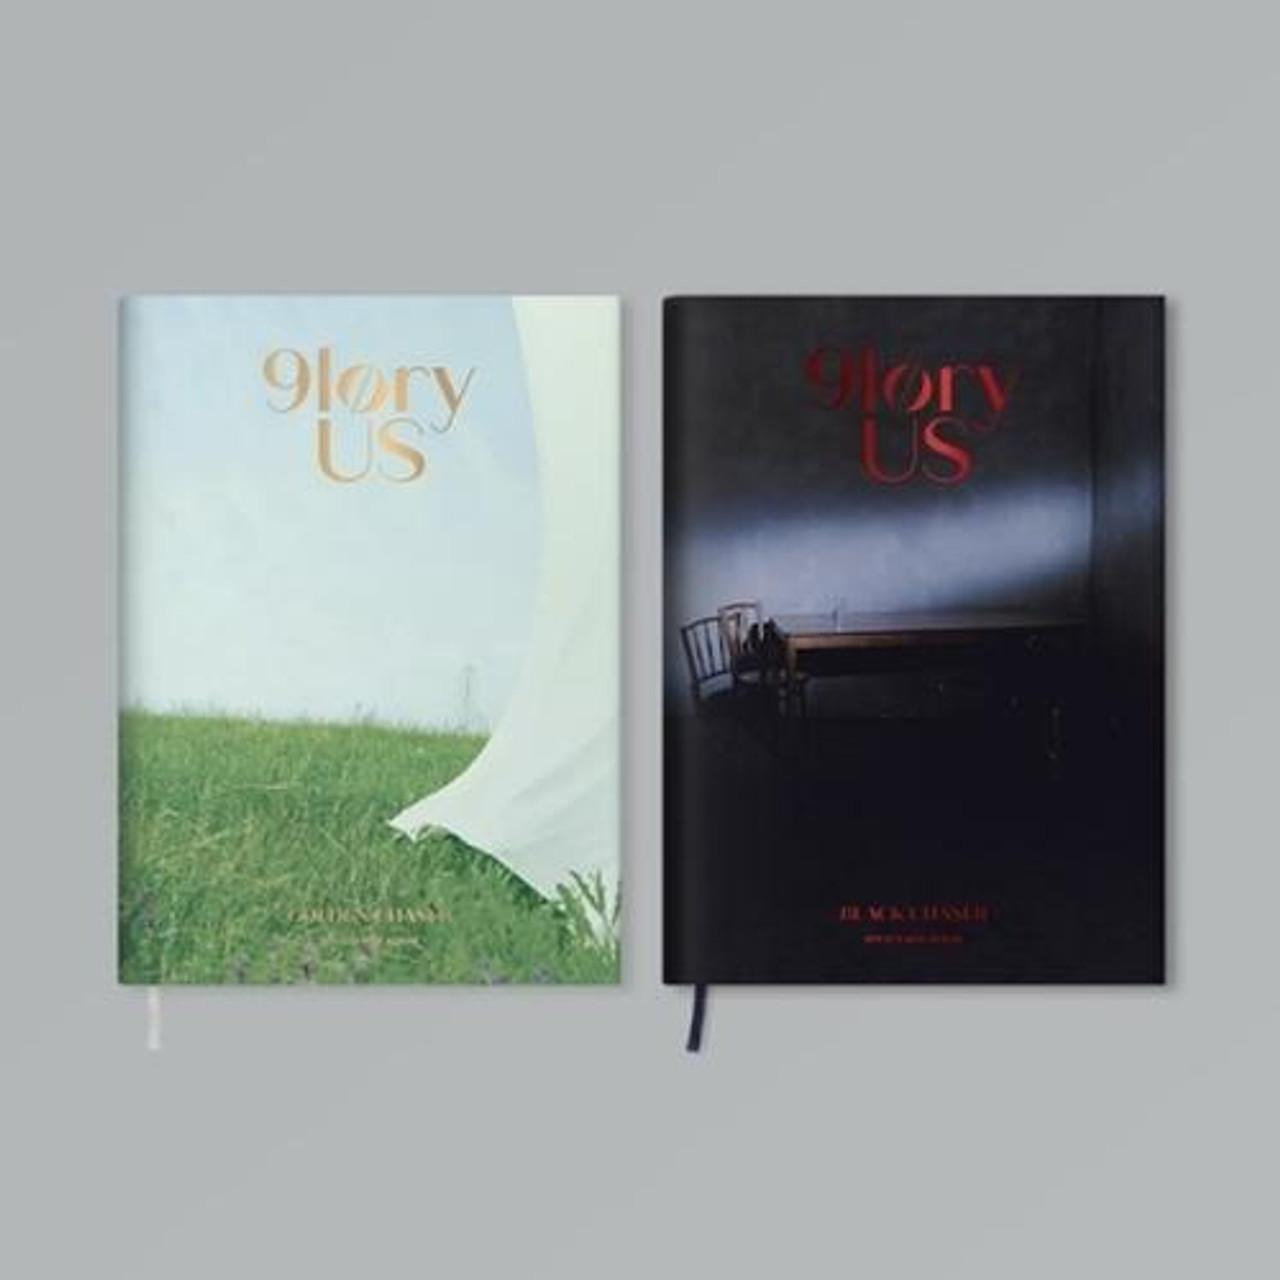 SF9 - 8th Mini [9loryUS] + Poster (Random ver)